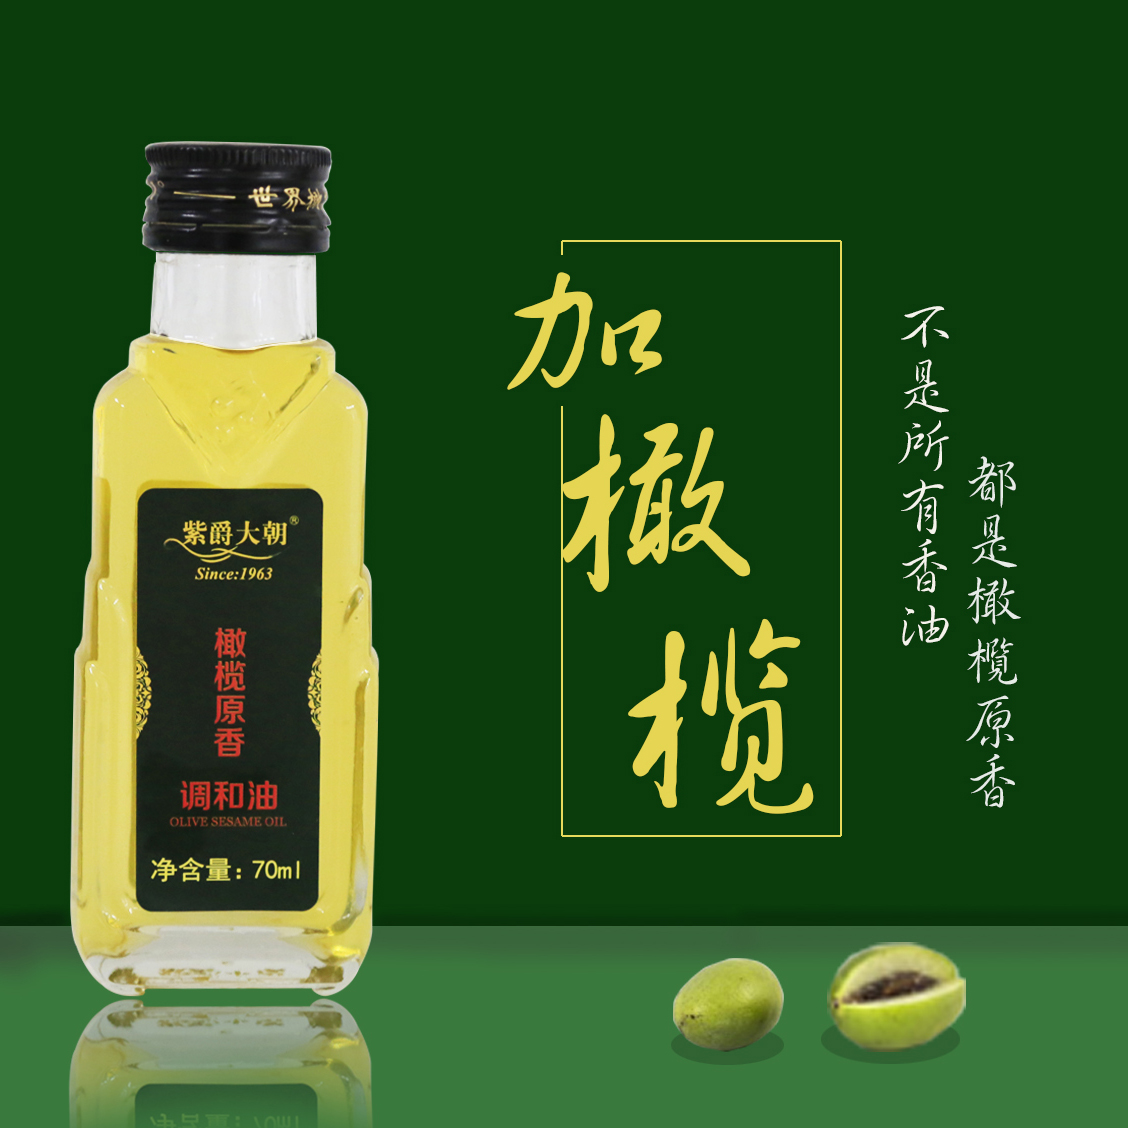 bobapp官方下载苹果版香油